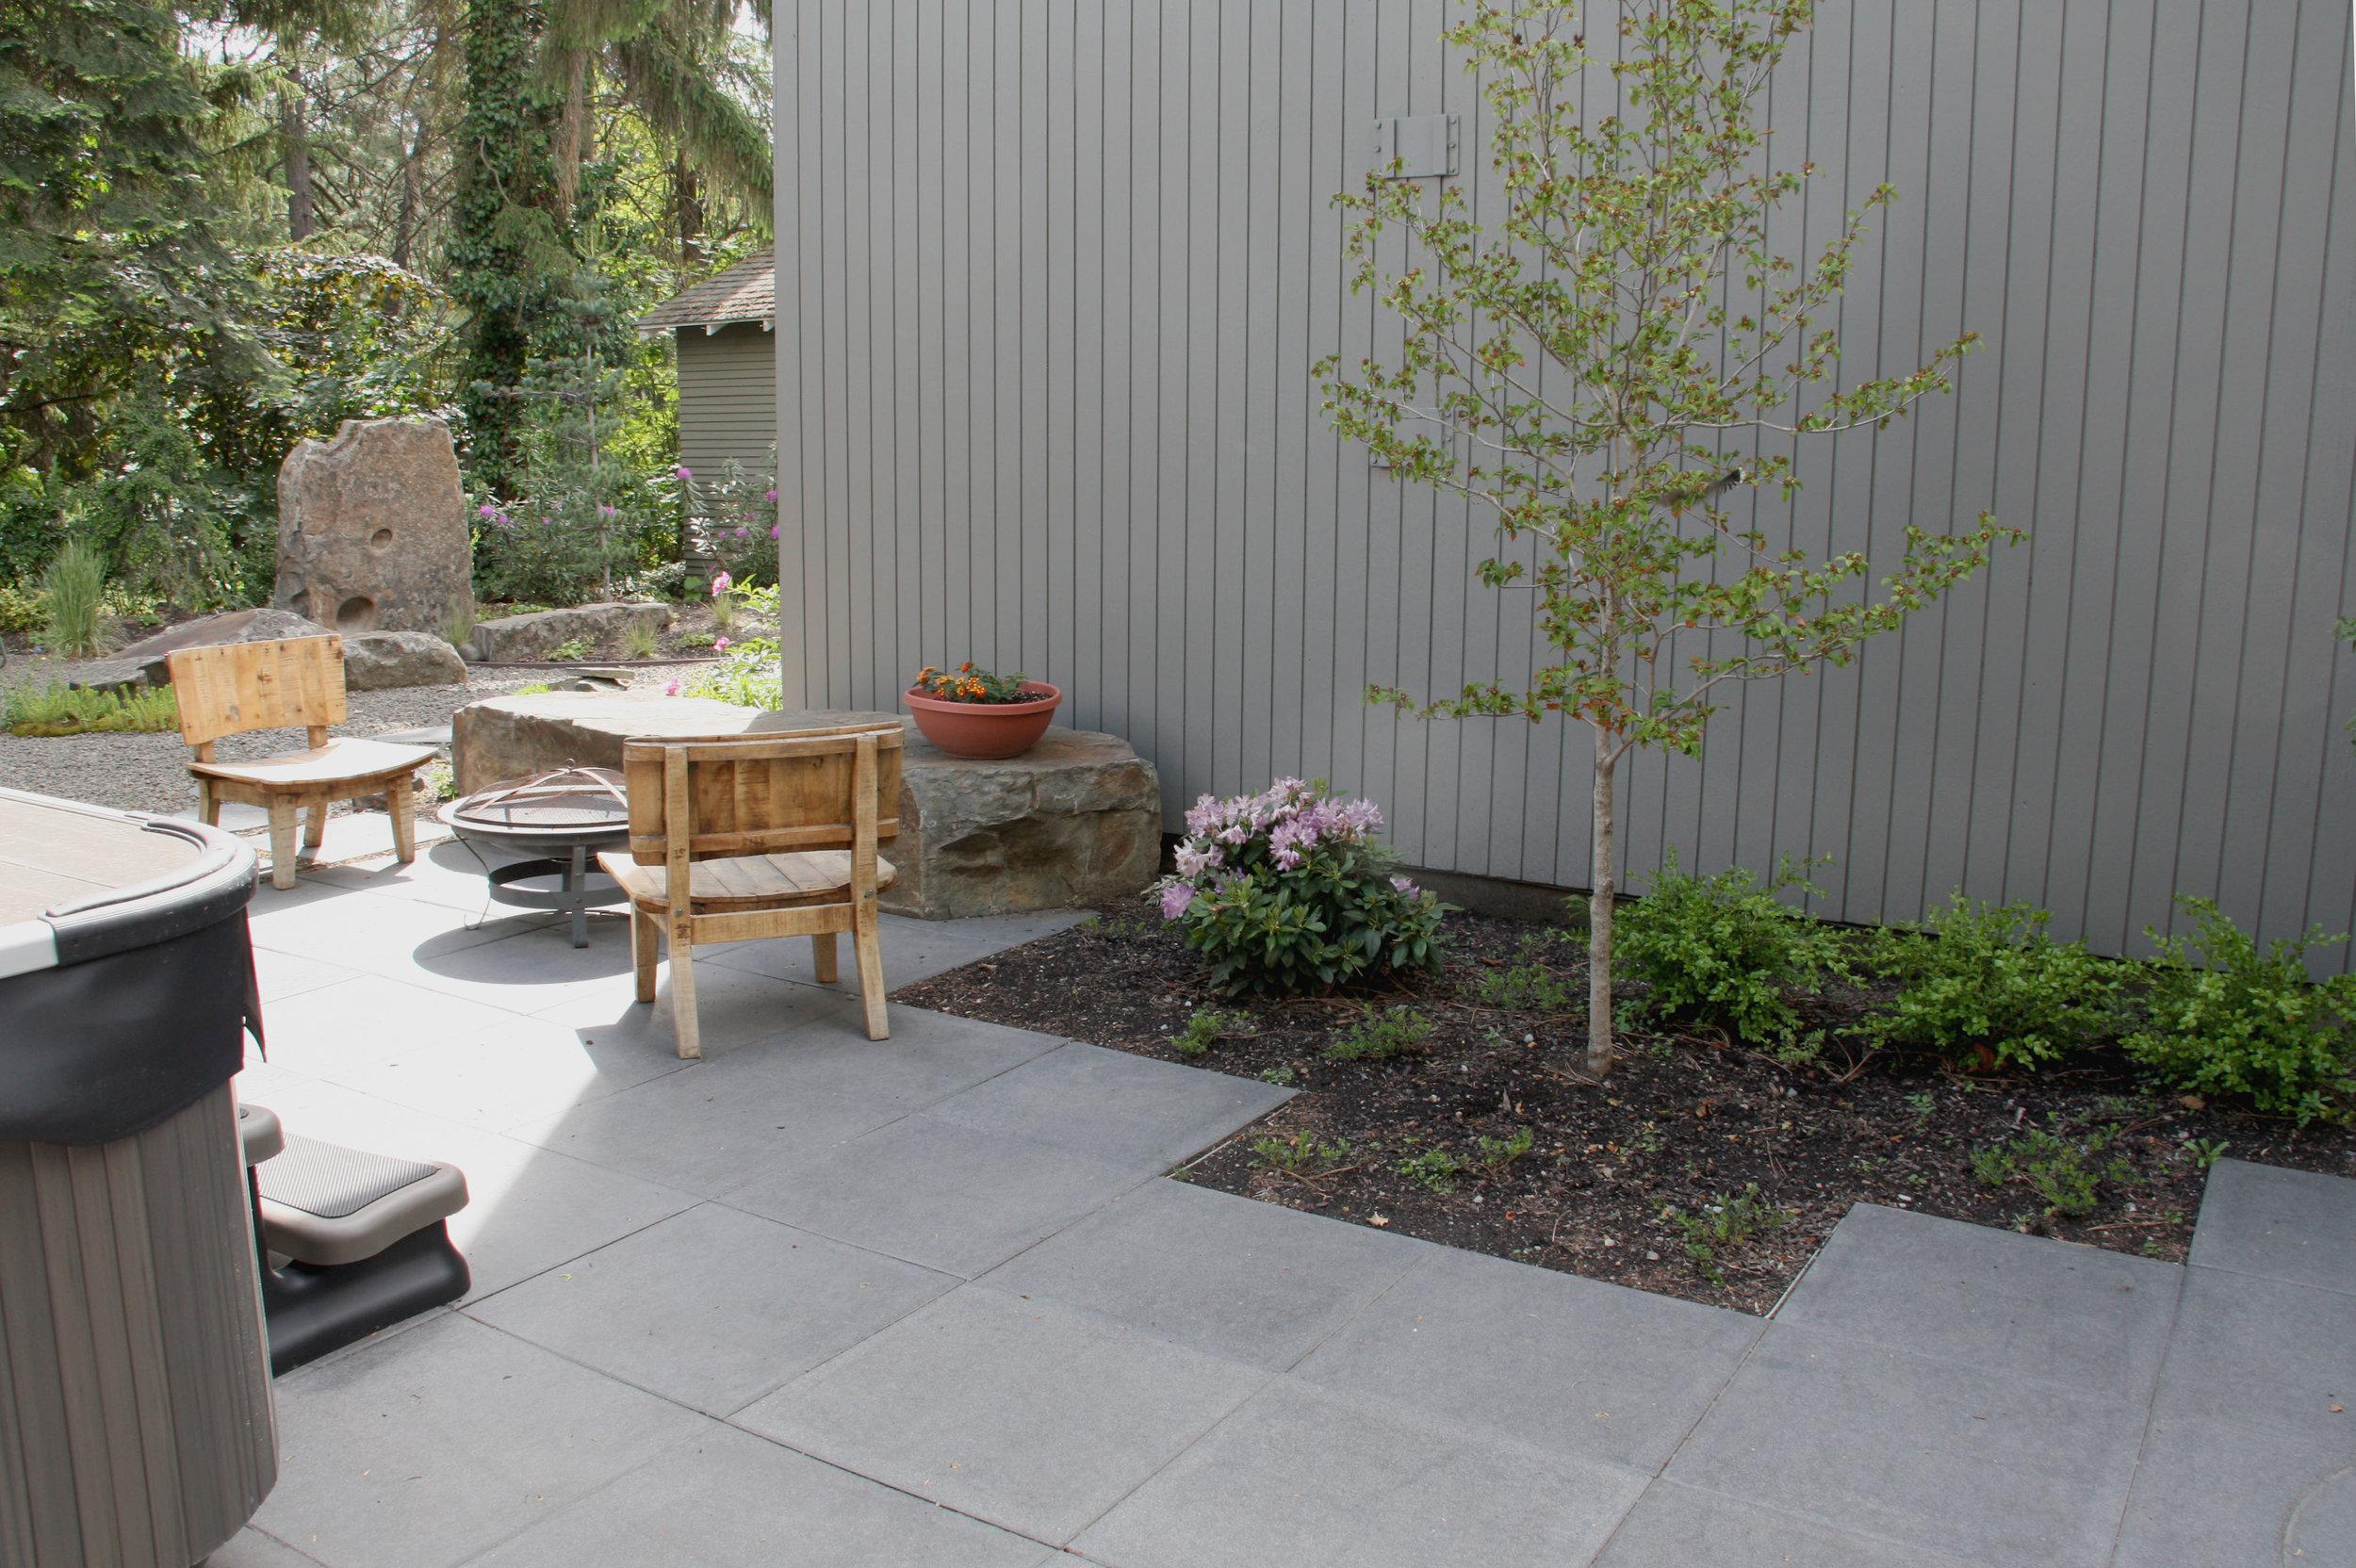 abbotsford-hydrapressed-paver-patio-2.JPG